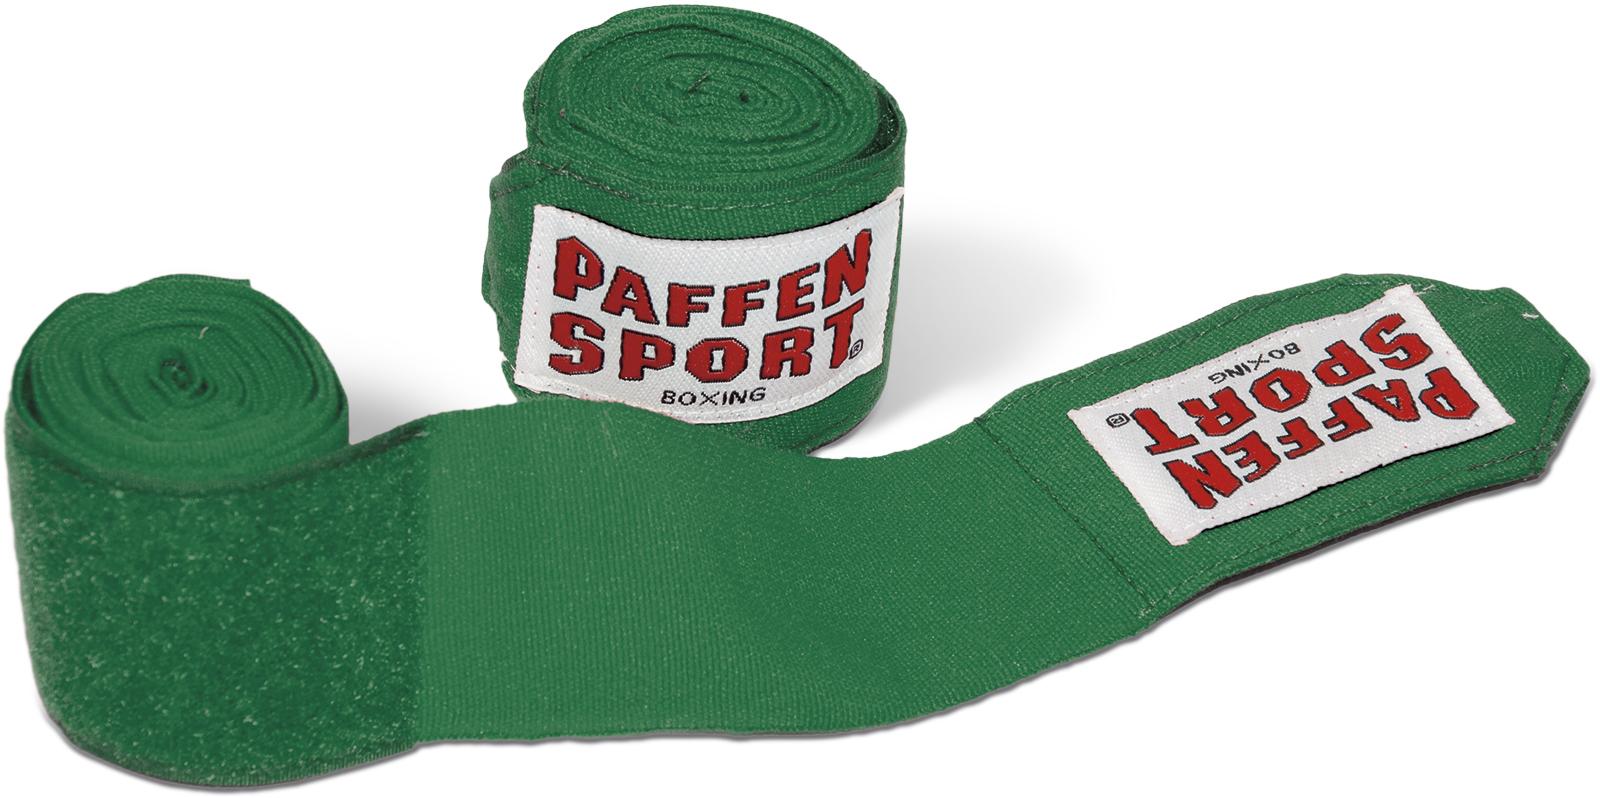 Боксерские бинты Paffen Sport ALLROUND Boxing bandages 3,5 м